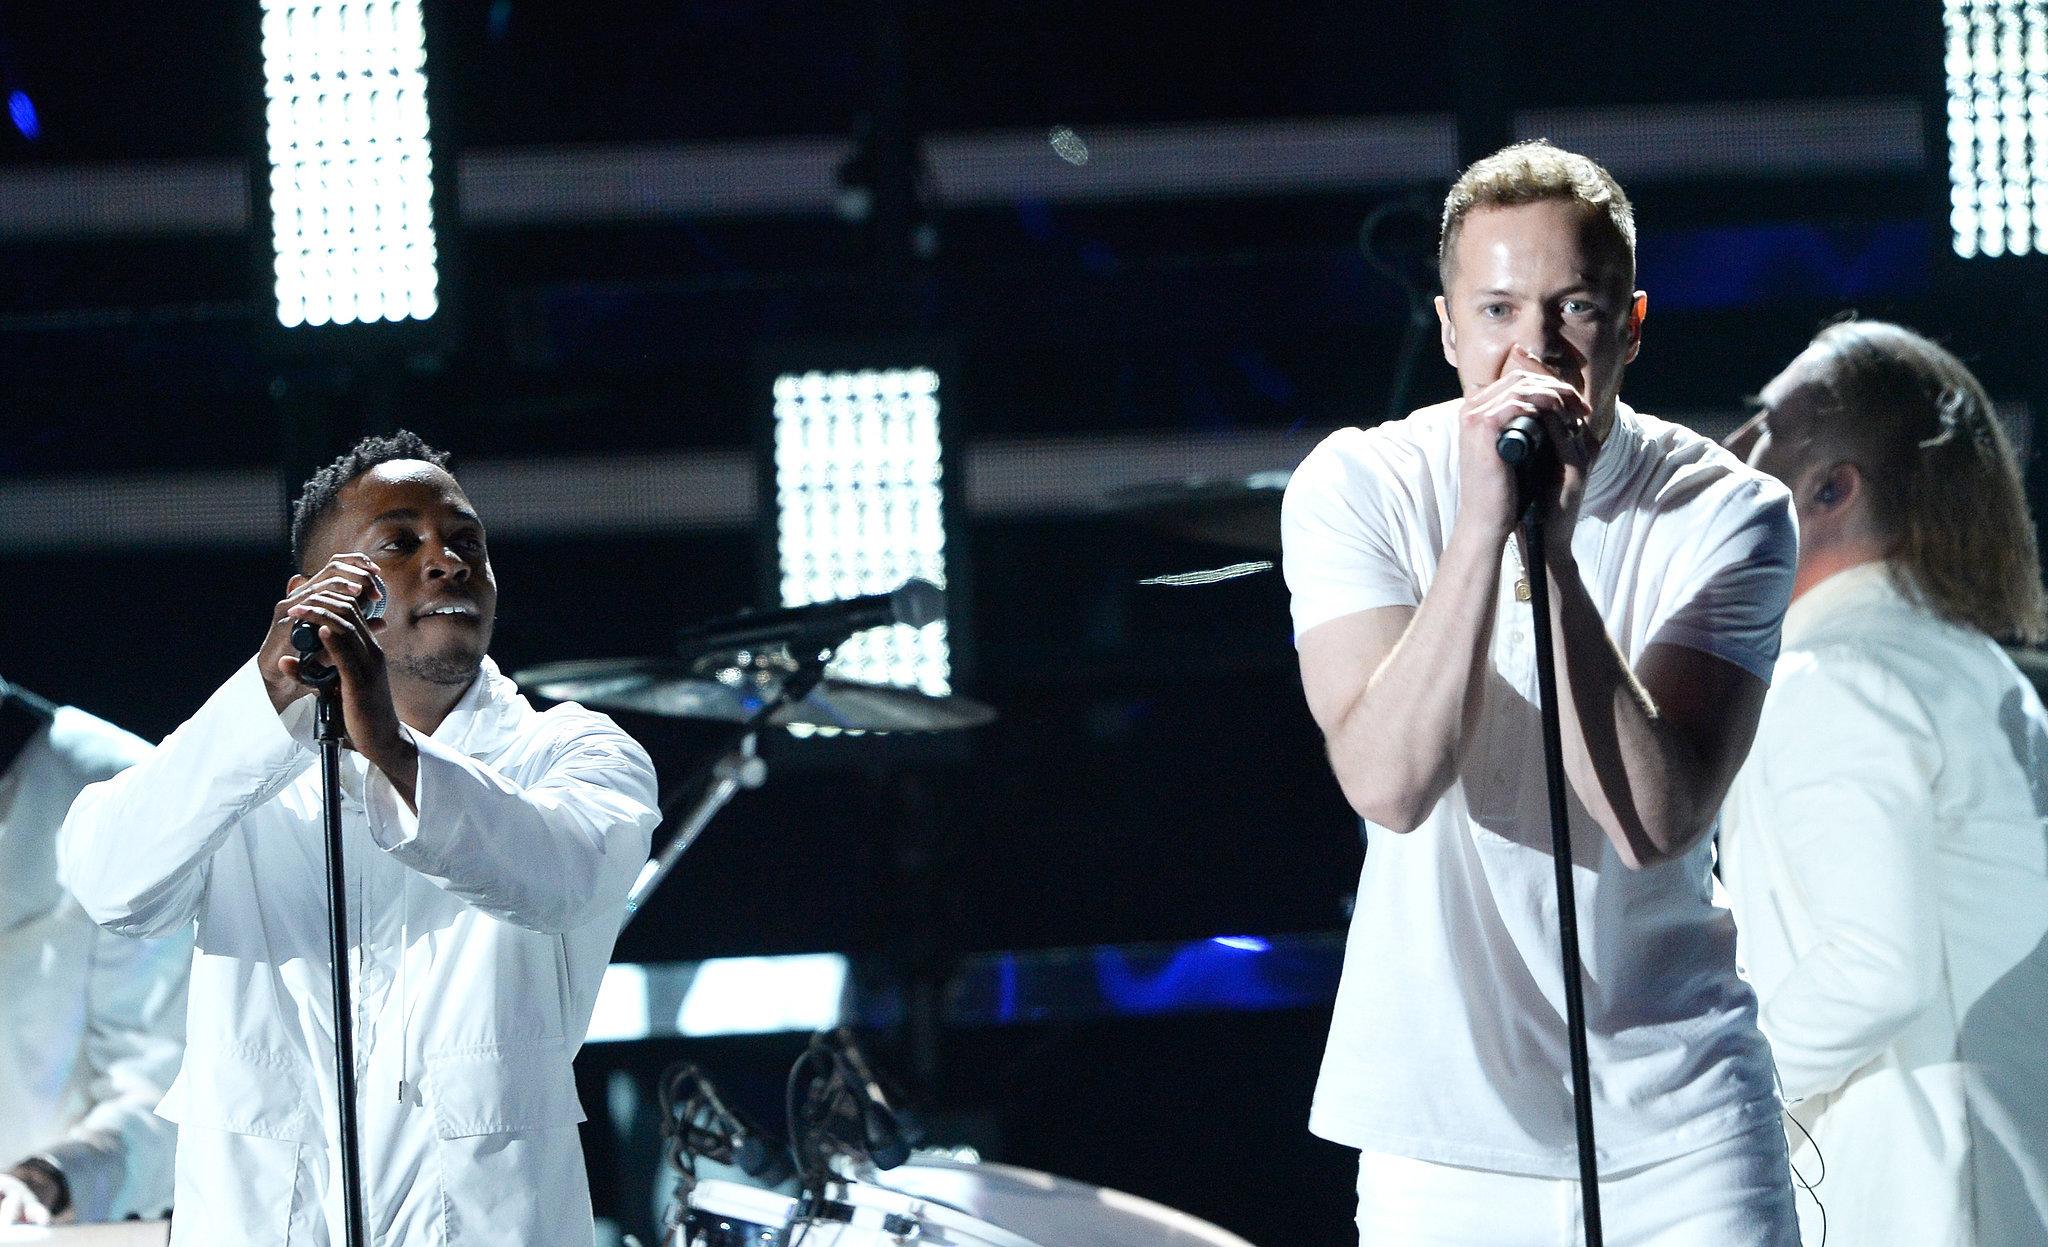 Dan Reynolds and Kendrick Lamar performed together